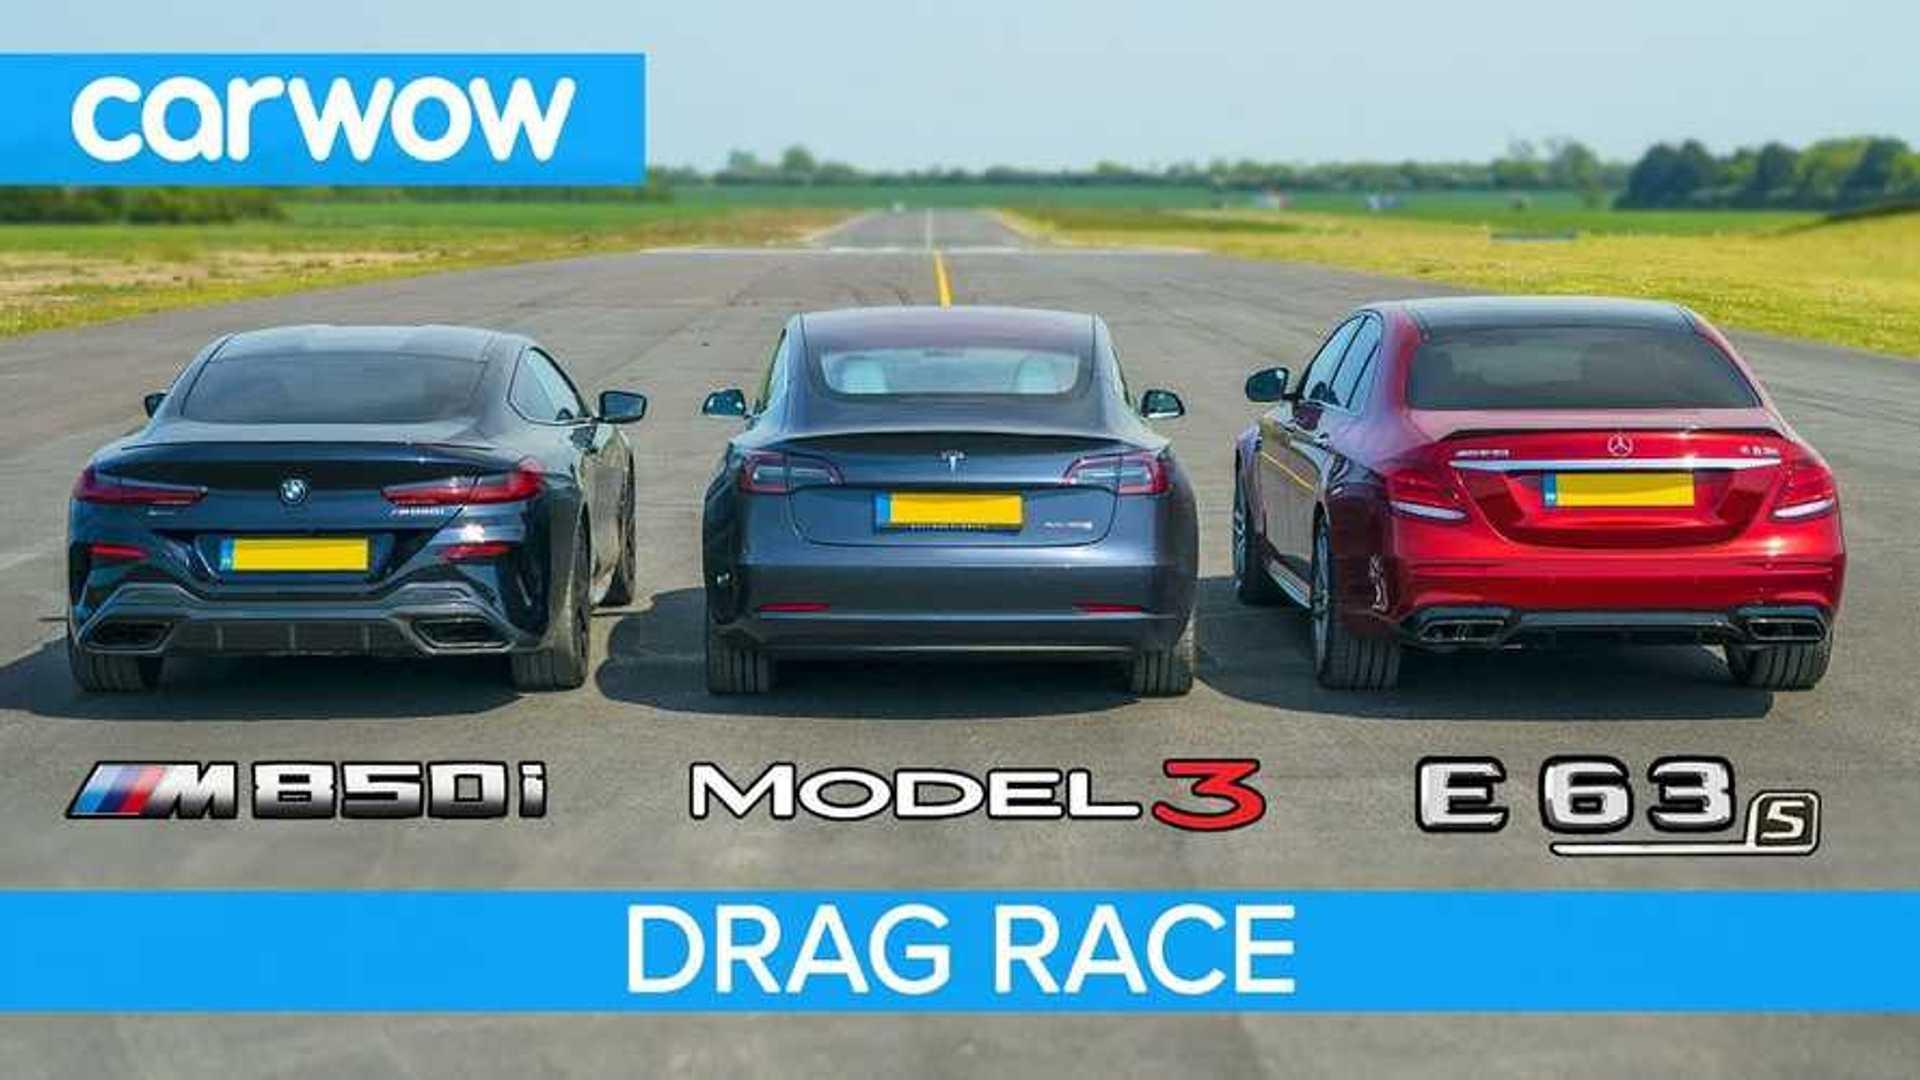 Tesla Model 3 Vs BMW M850i Vs Mercedes-AMG E63 S: Drag Race Video